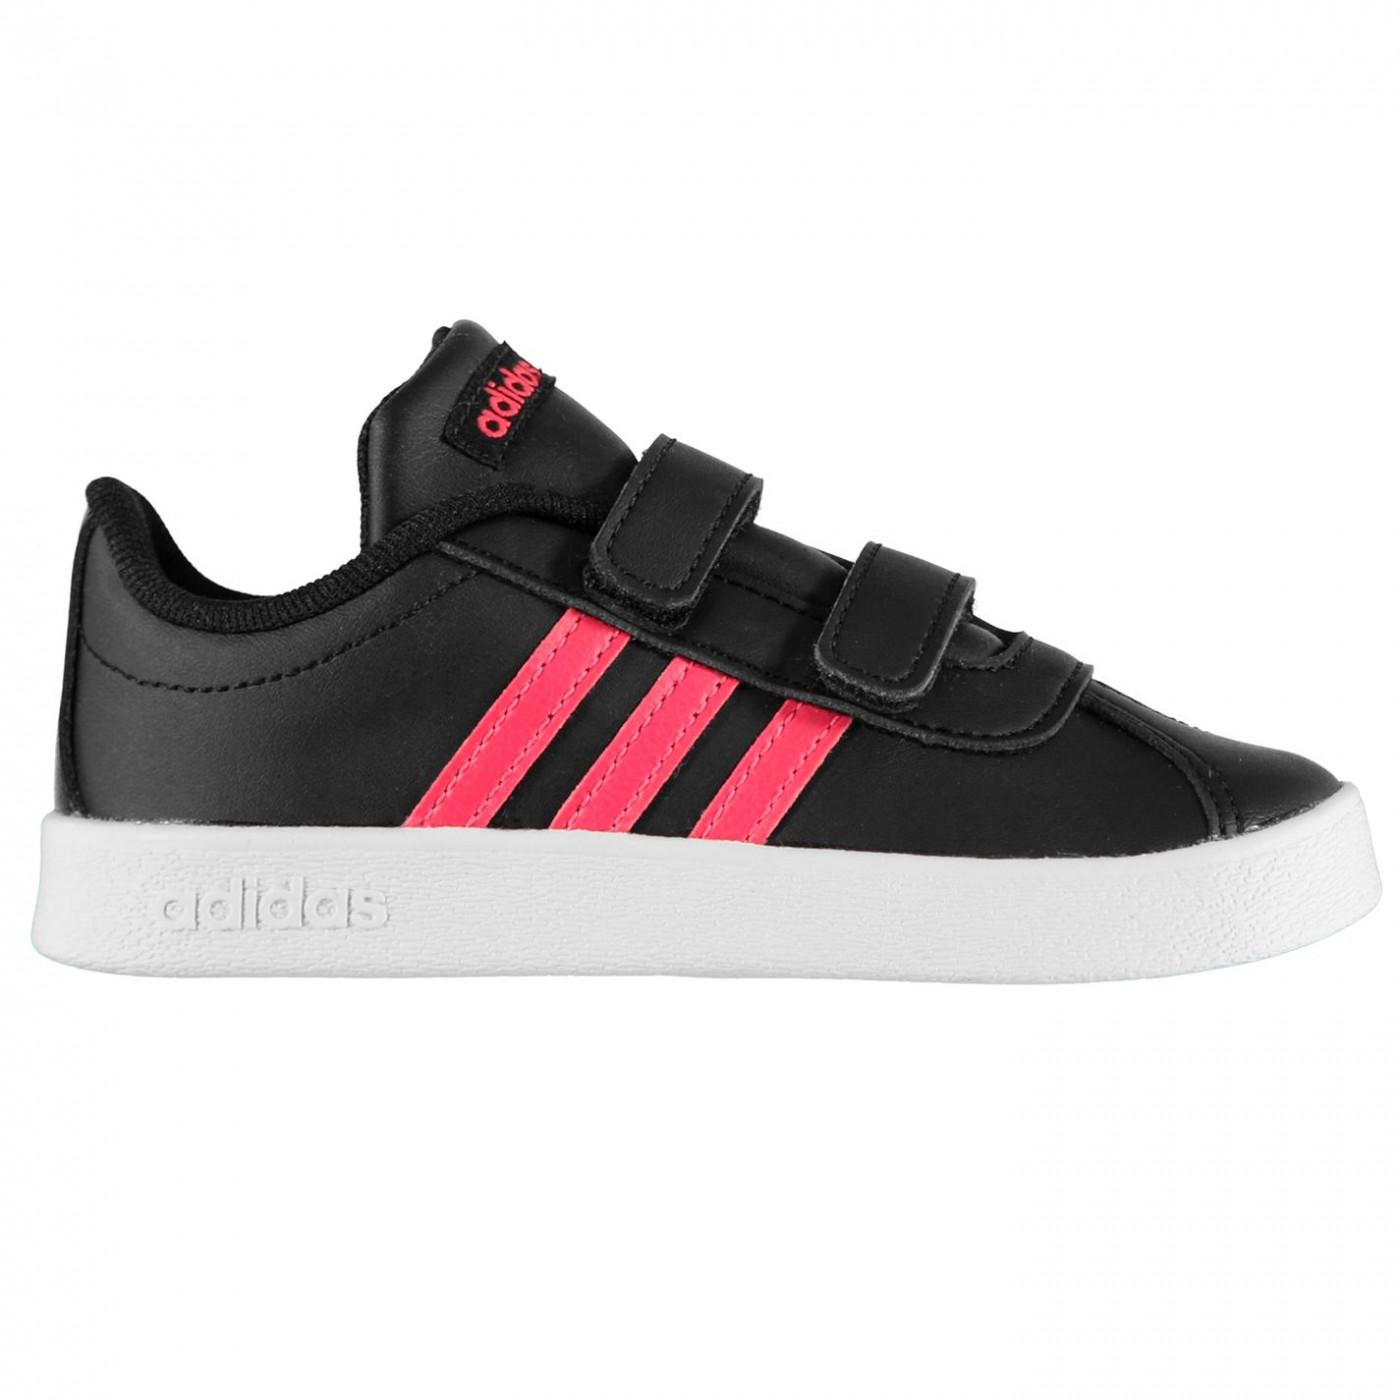 Adidas VL Court Shoes Infant Girls